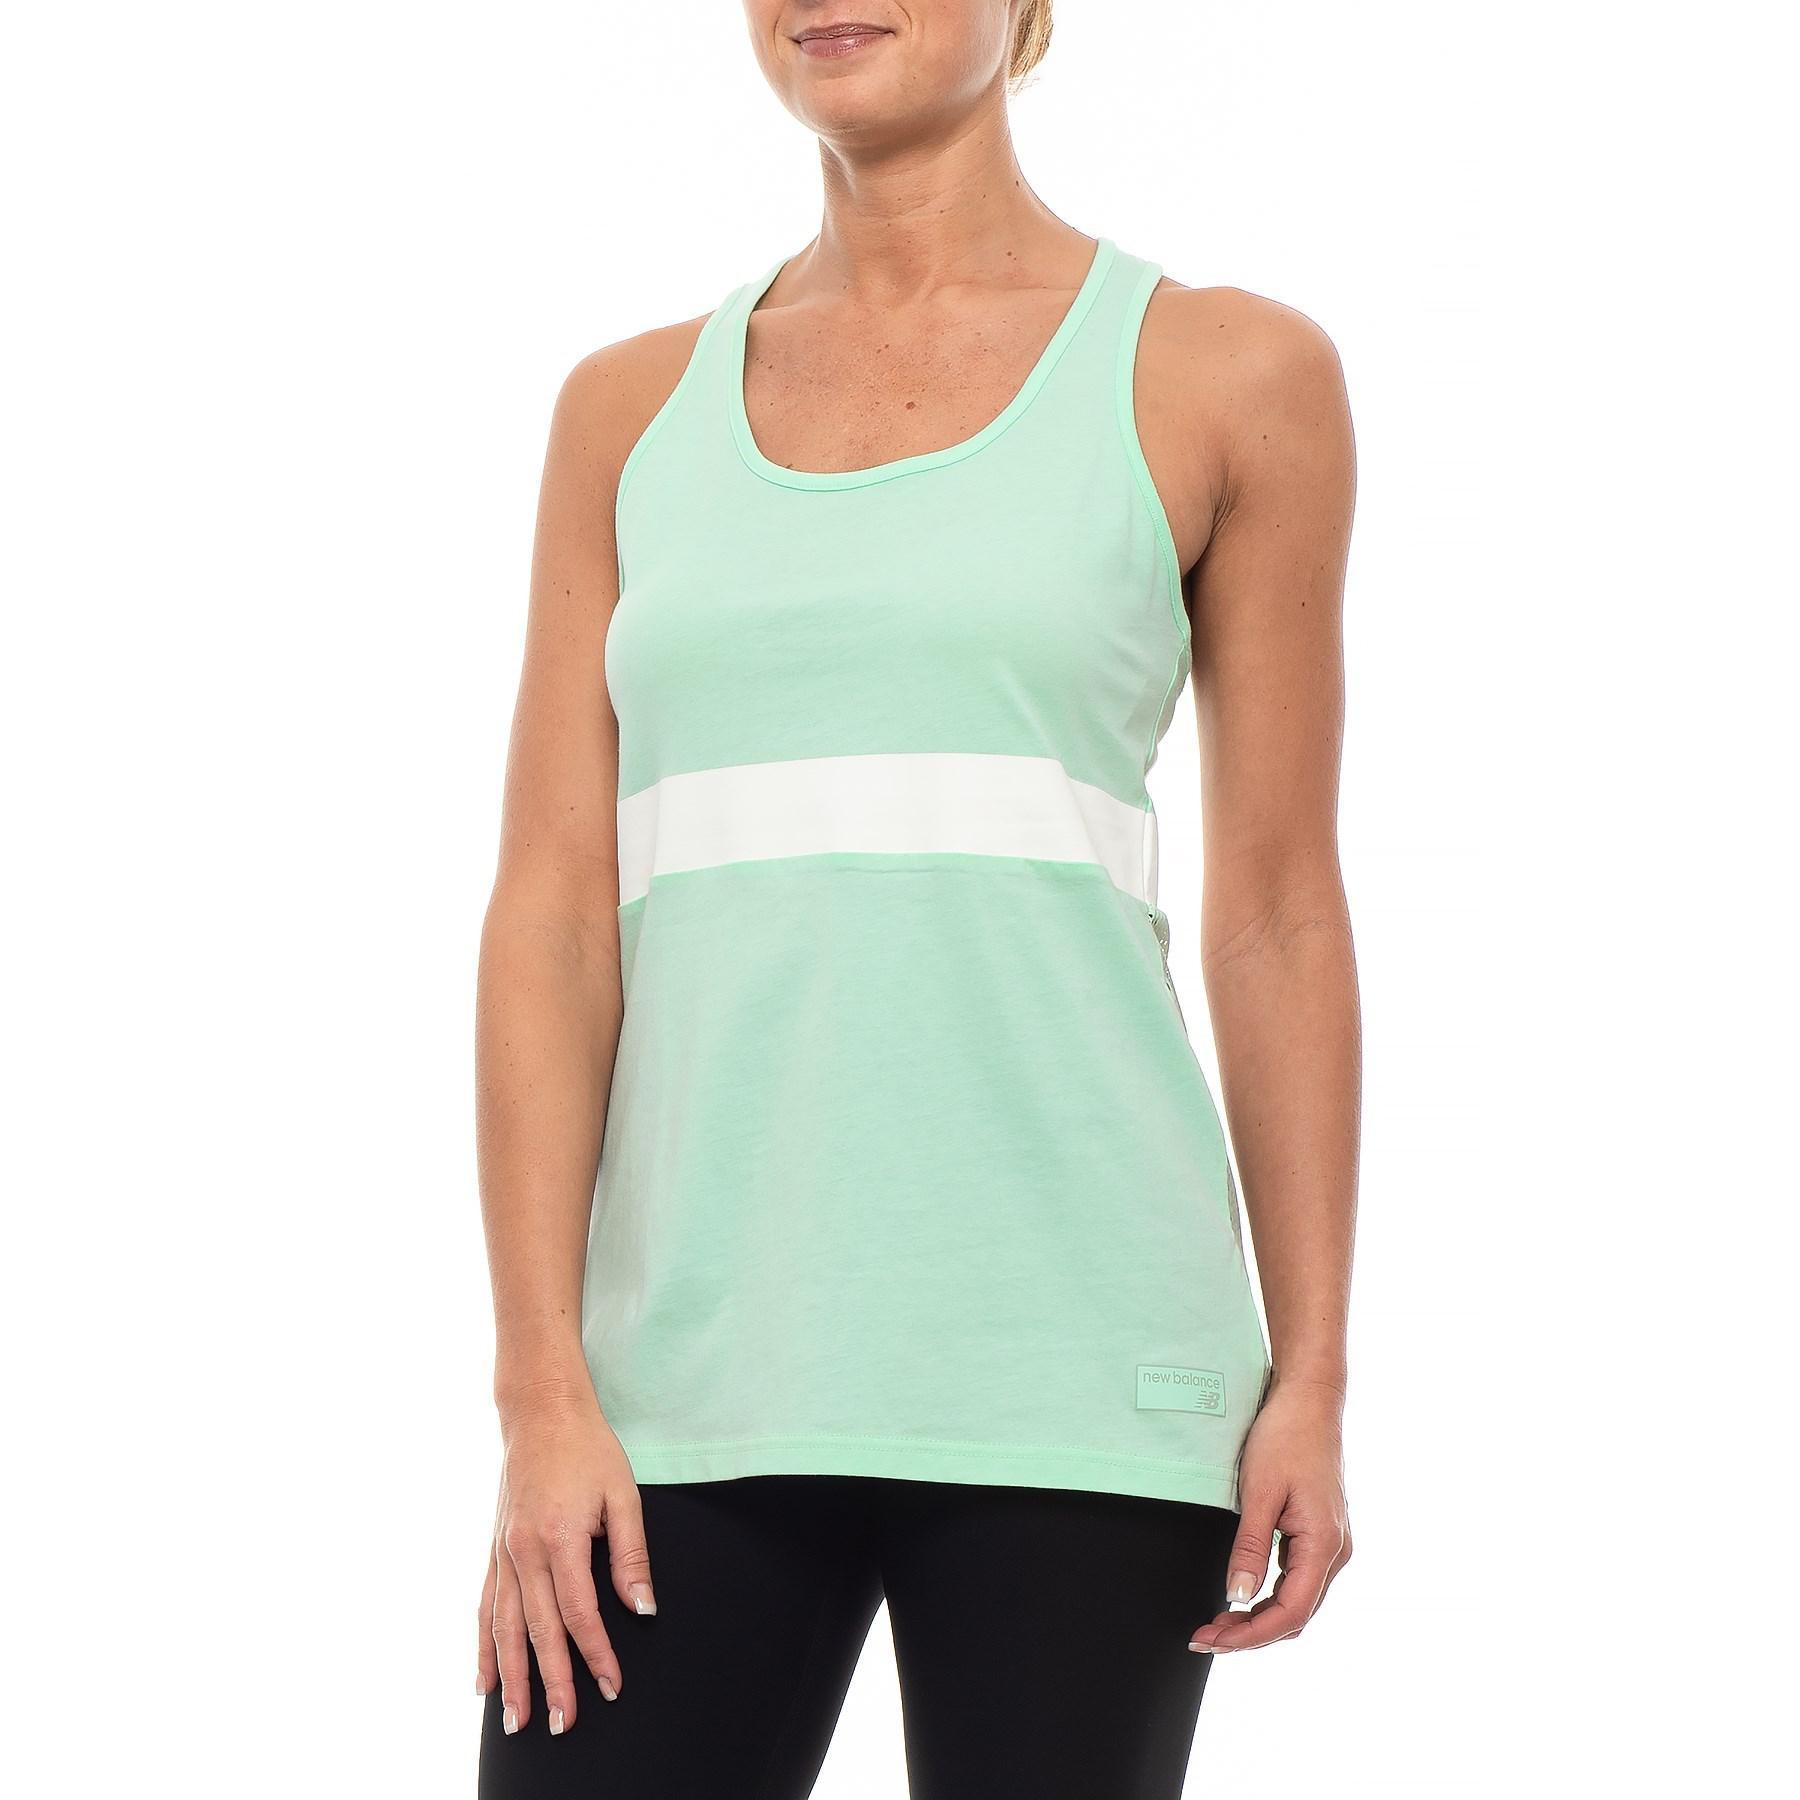 506ca9df3bd21 New Balance - Green Nb Athletics Novelty Tank Top (for Women) - Lyst. View  fullscreen